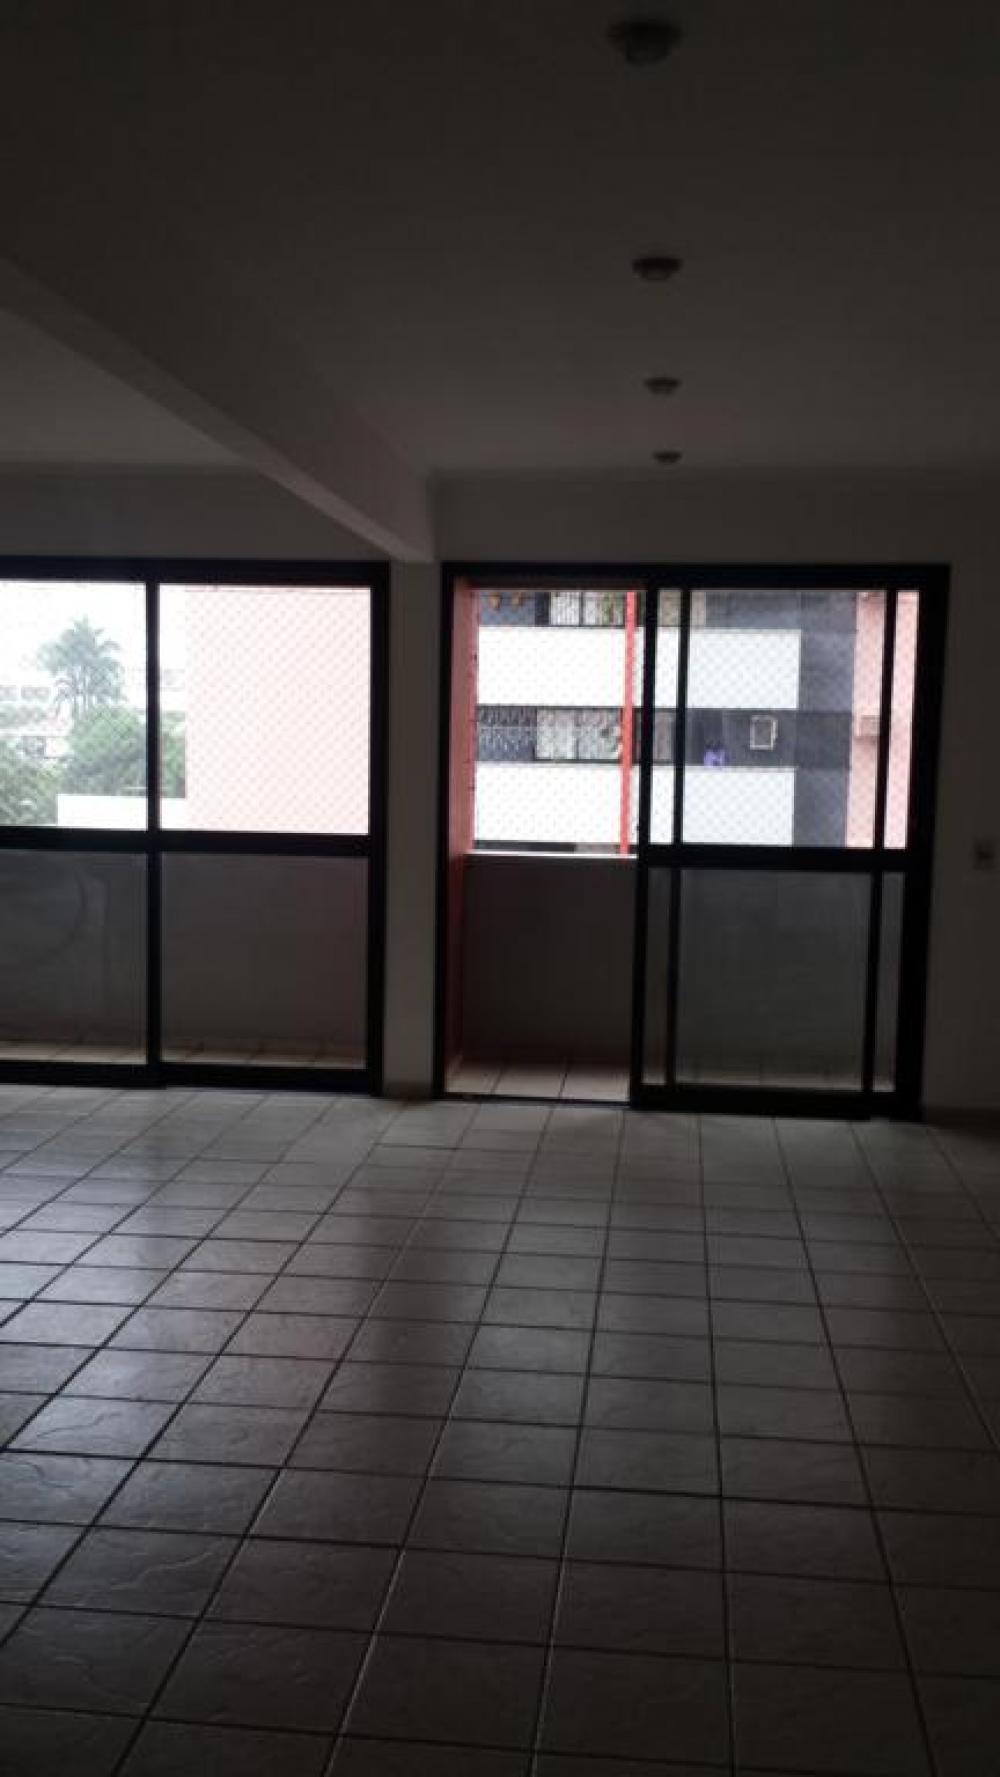 SAO JOSE DO RIO PRETO Apartamento Venda R$700.000,00 Condominio R$940,00 4 Dormitorios 1 Suite Area construida 200.00m2